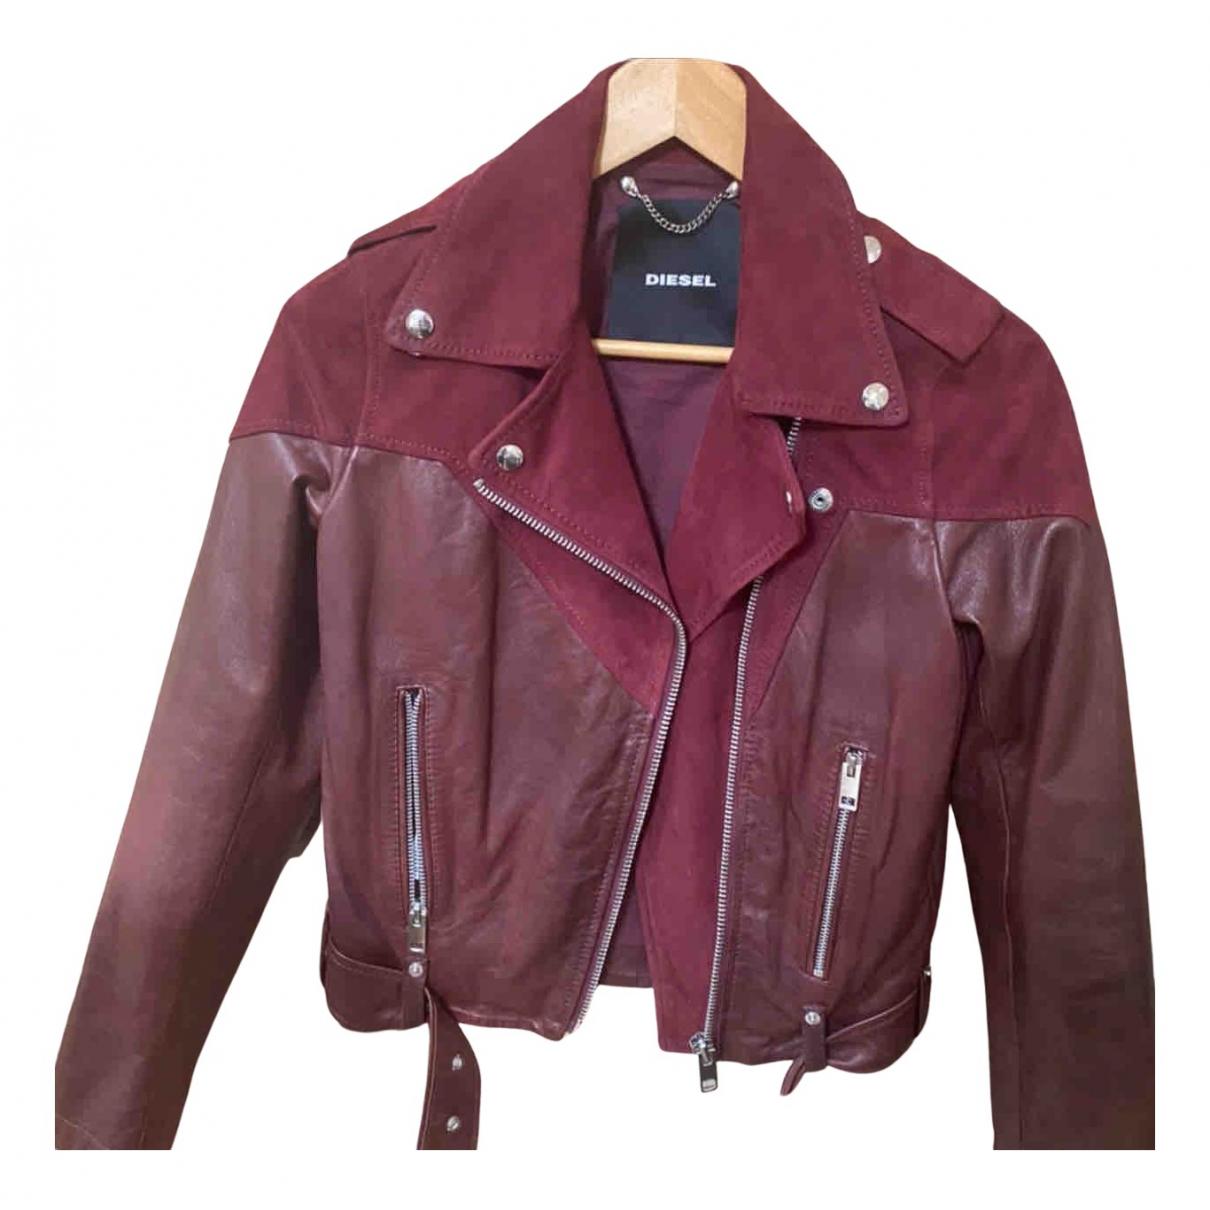 Diesel N Burgundy Leather jacket for Women XS International